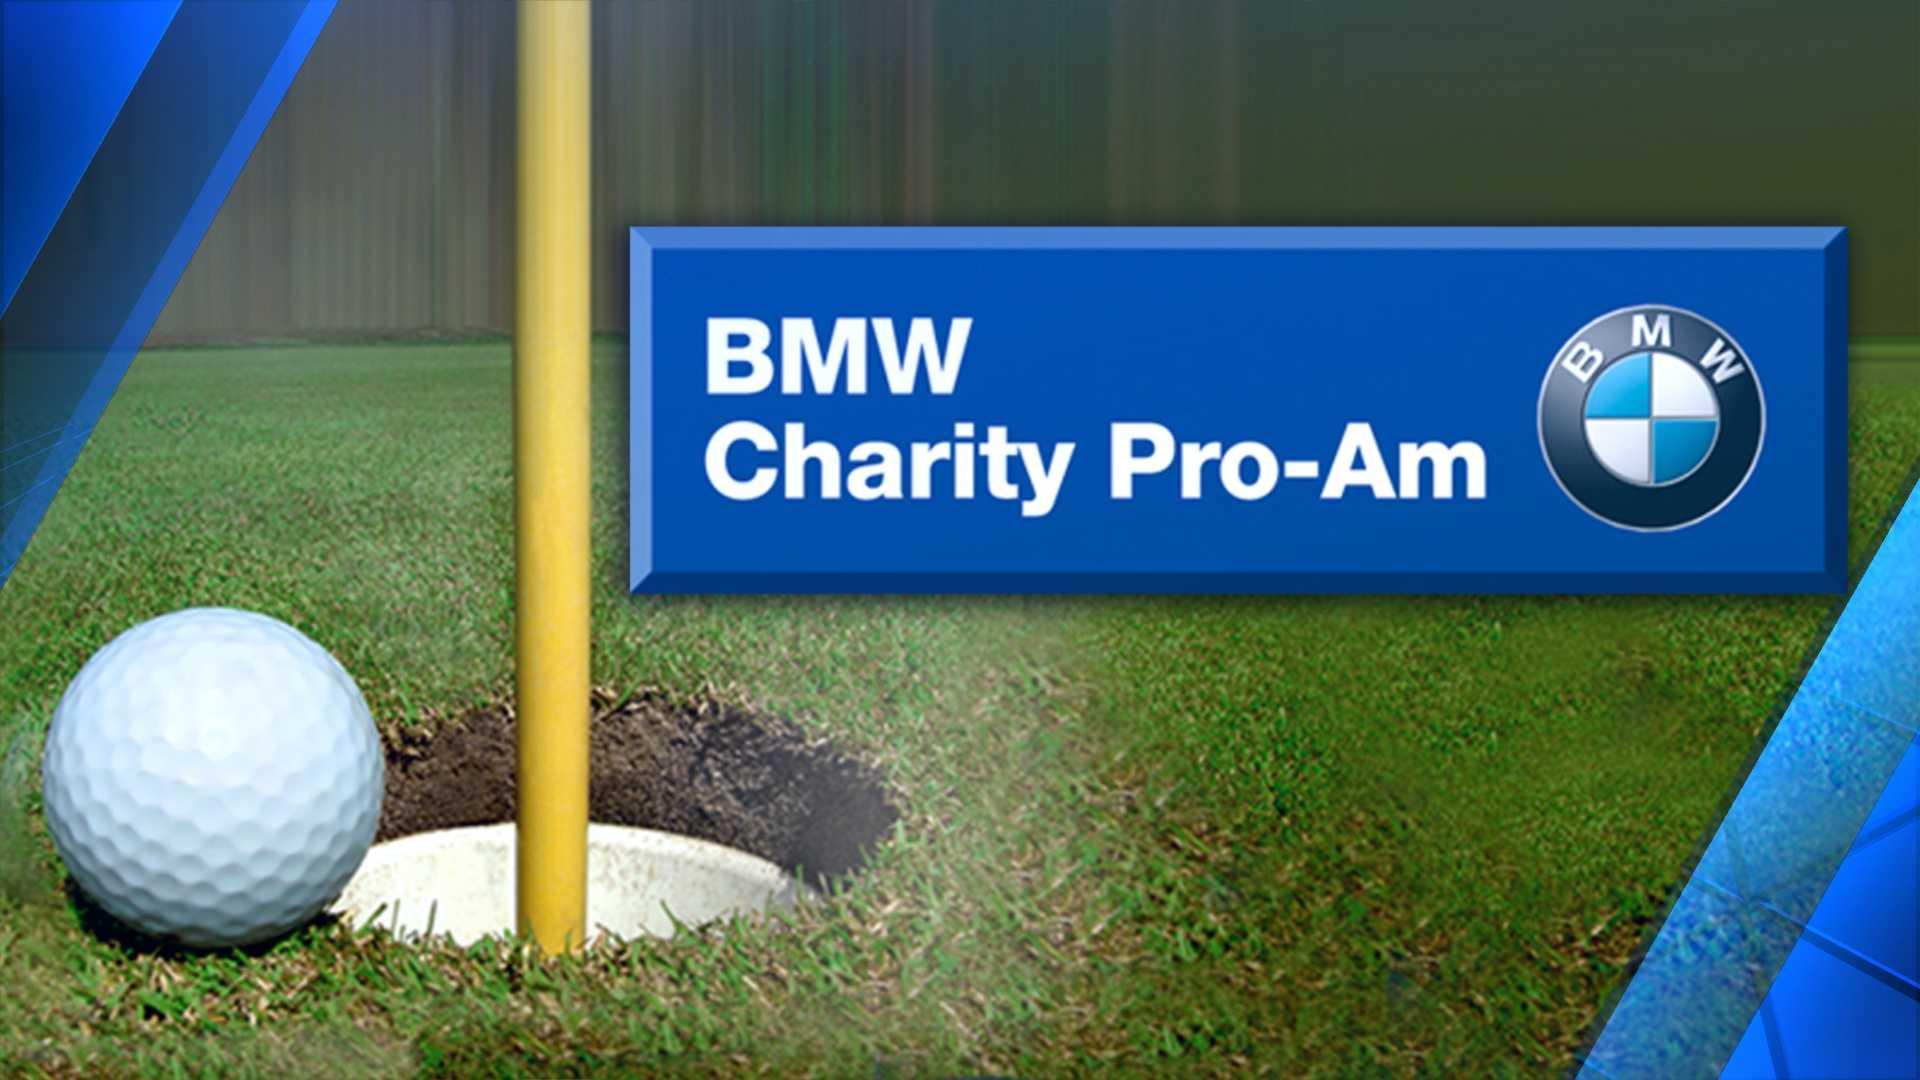 BMW Charity Pro-Am Golf Tournament